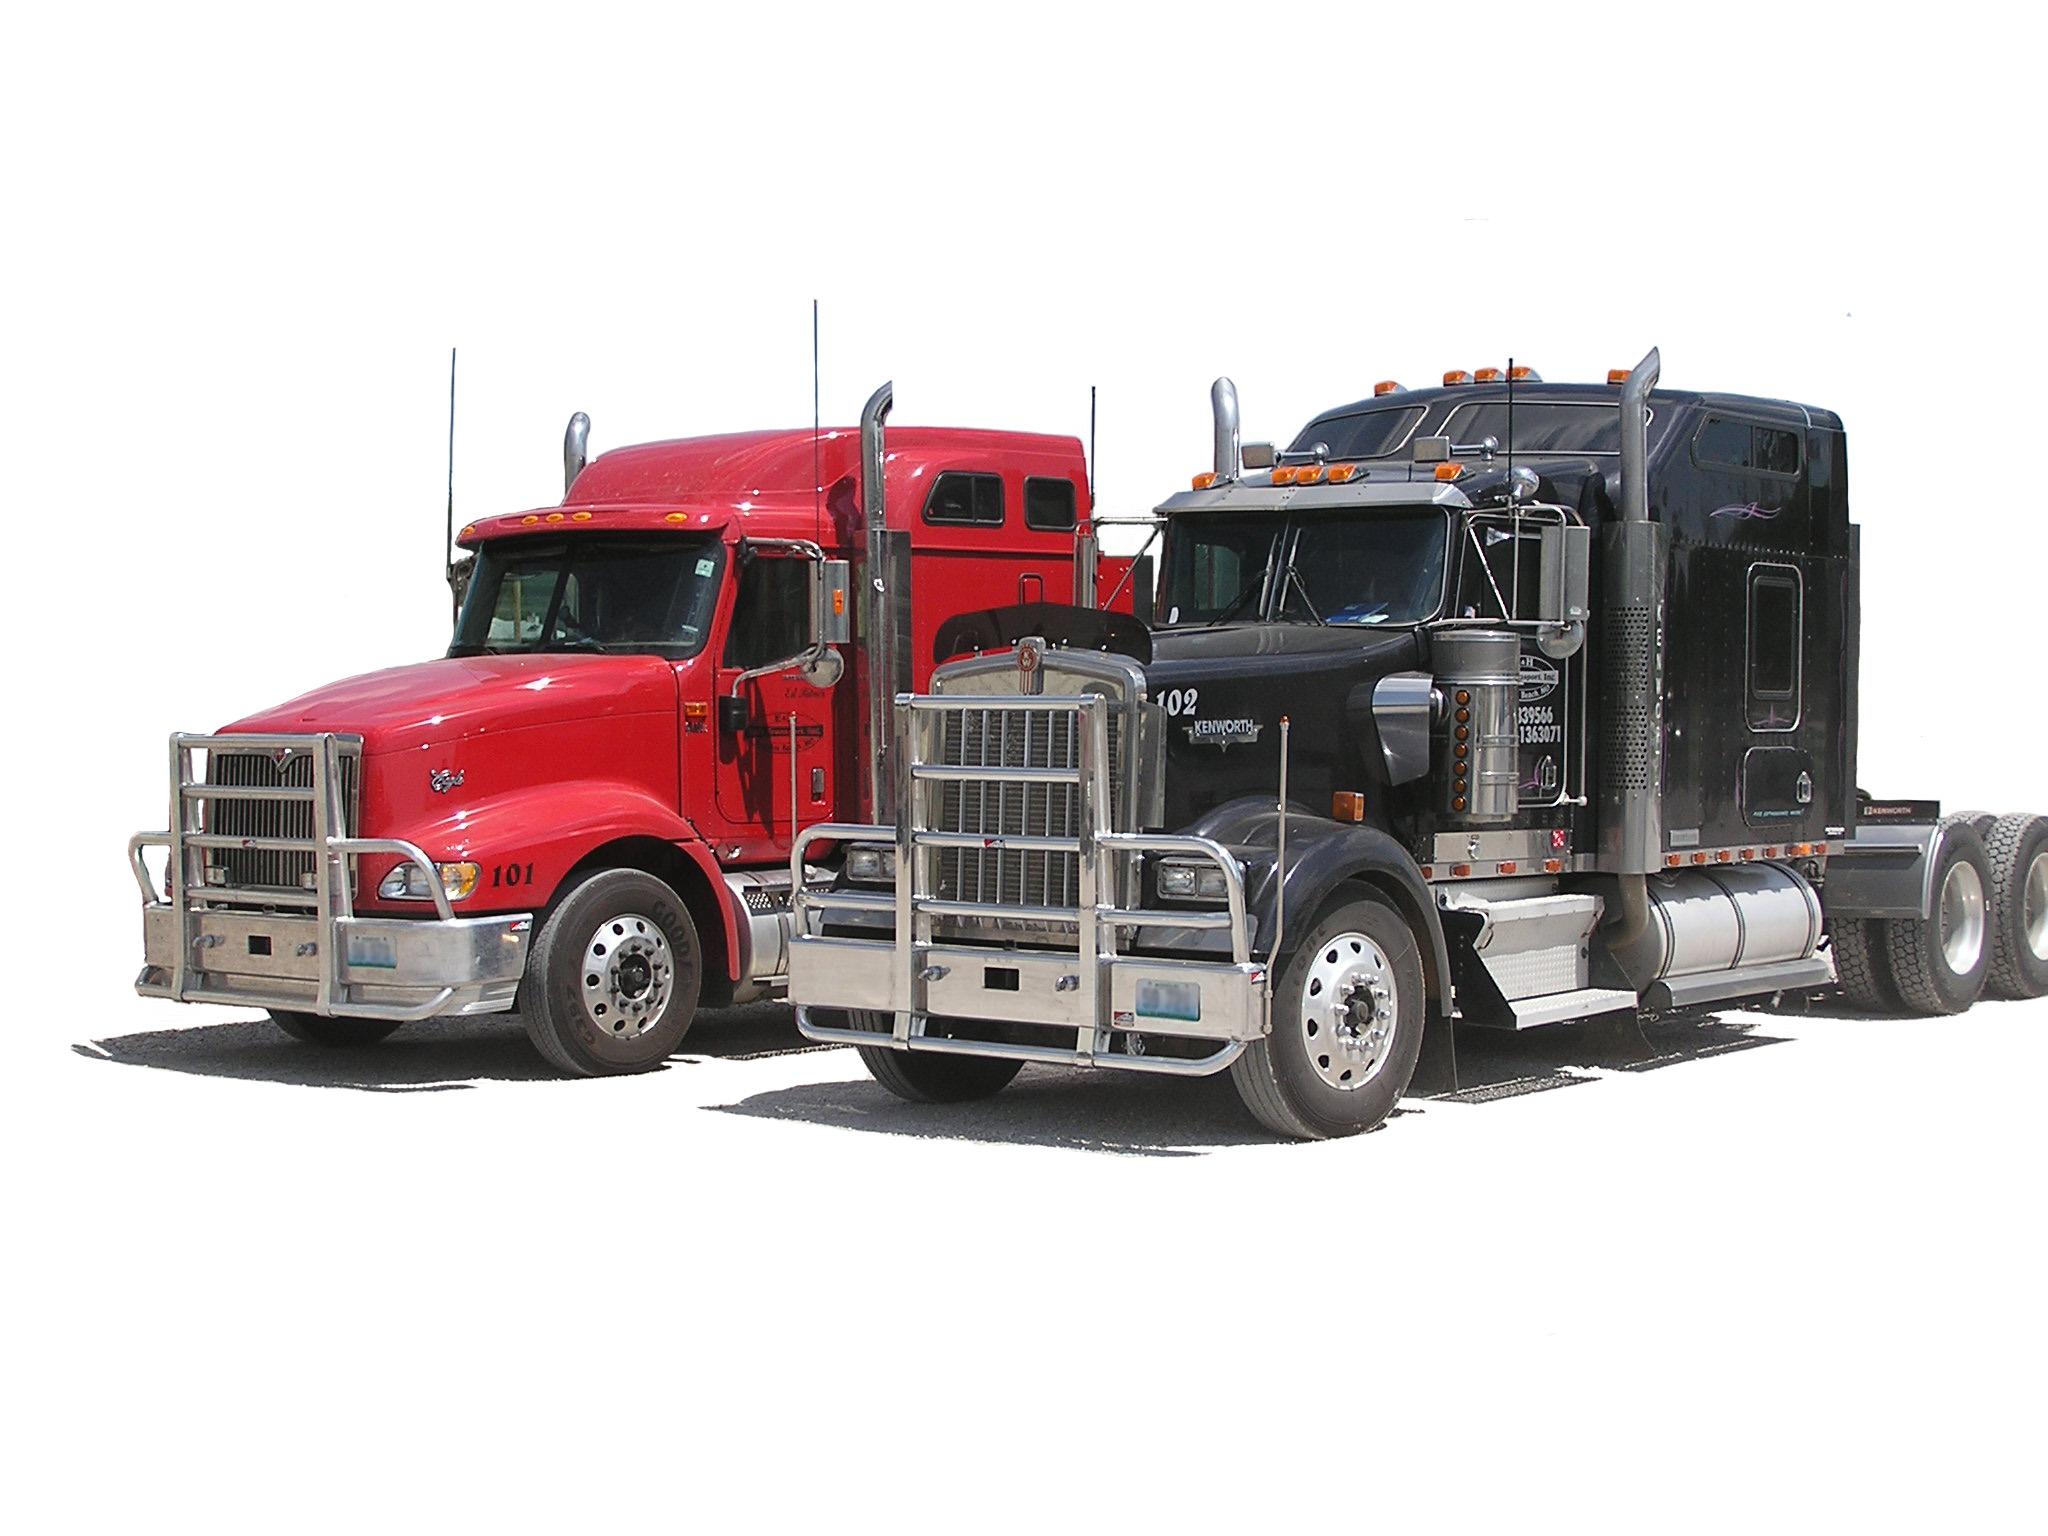 Big Rig on Big Rig Truck Kits